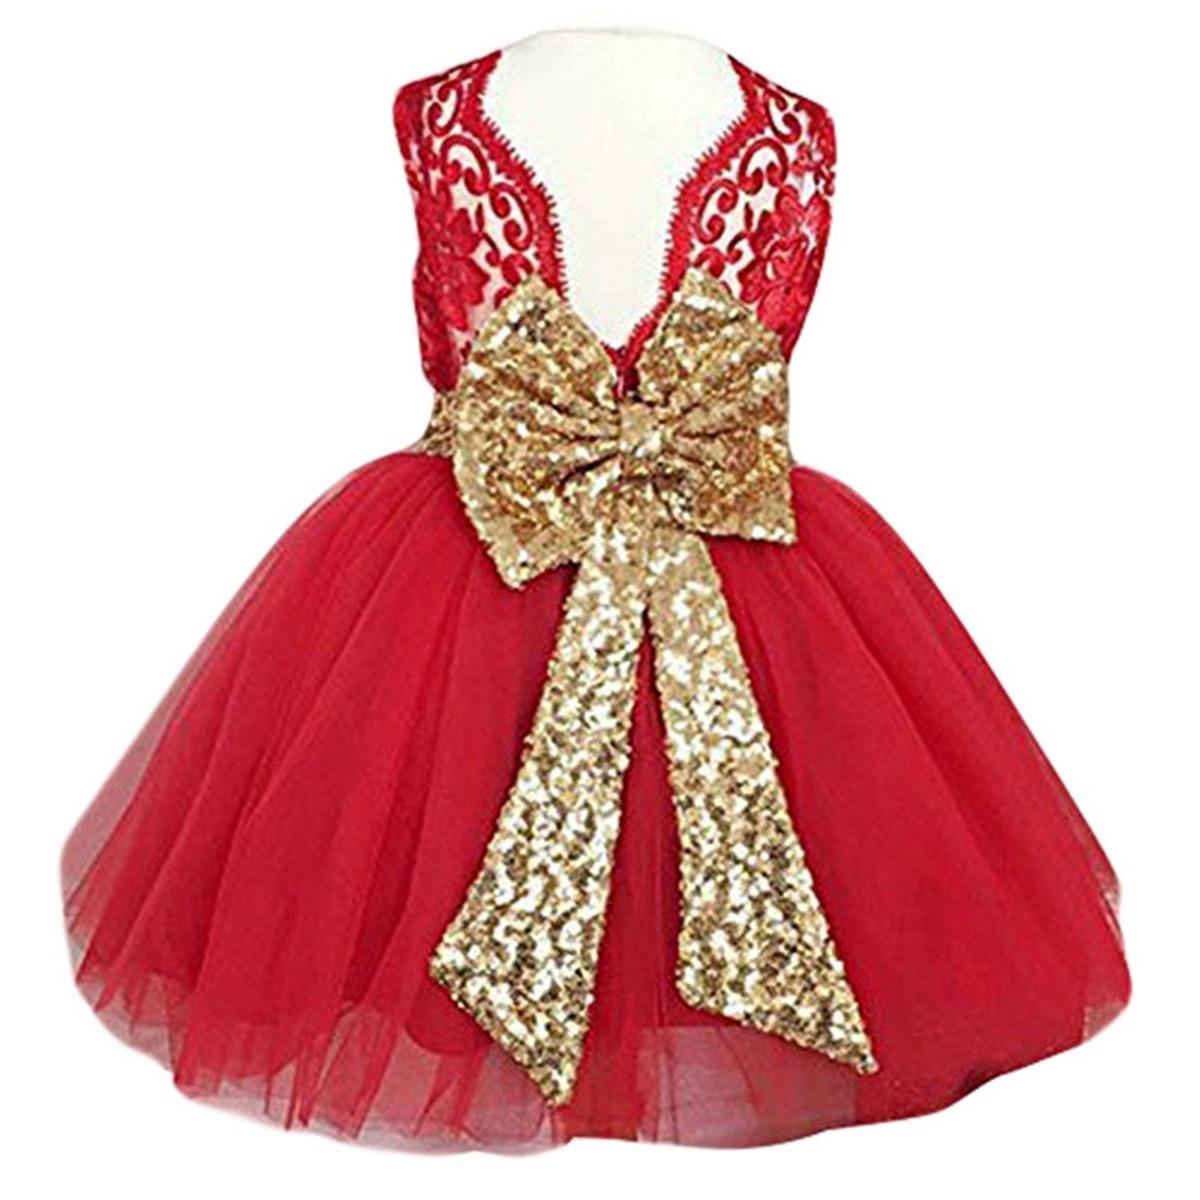 edb235bc6 vestido para niñas rojo bodas fiestas comunion fkkfyy. Cargando zoom.